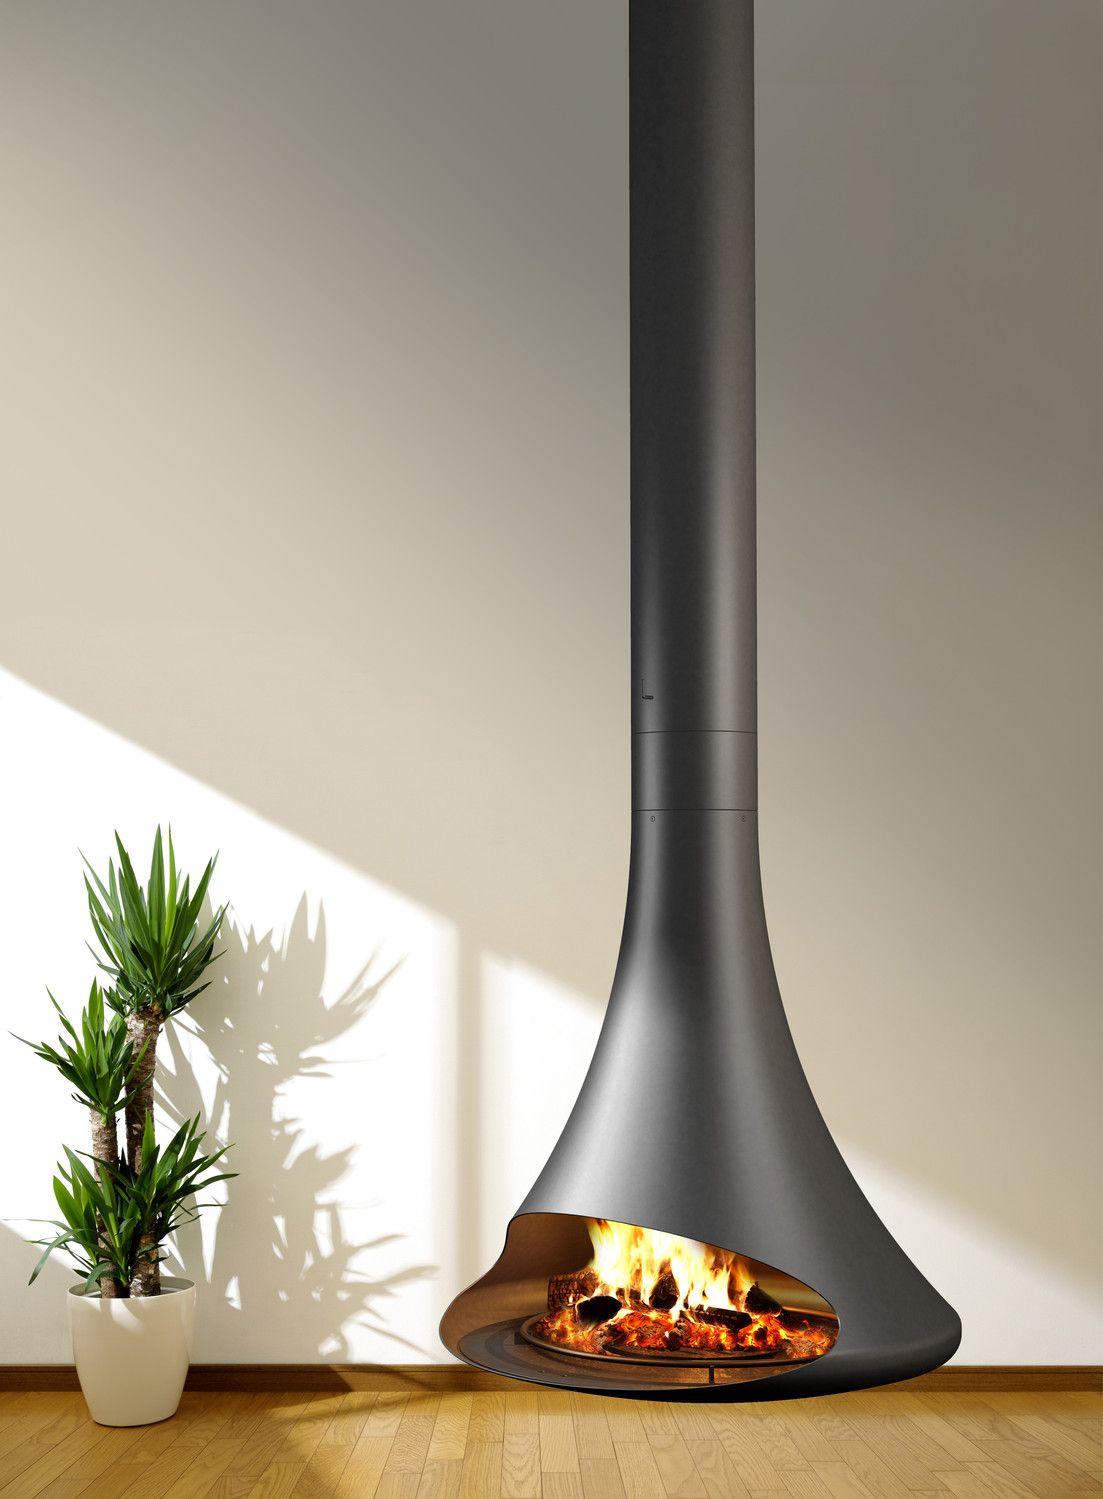 M s de 25 ideas incre bles sobre chimeneas de pellets en - Adaptar chimenea para calefaccion ...